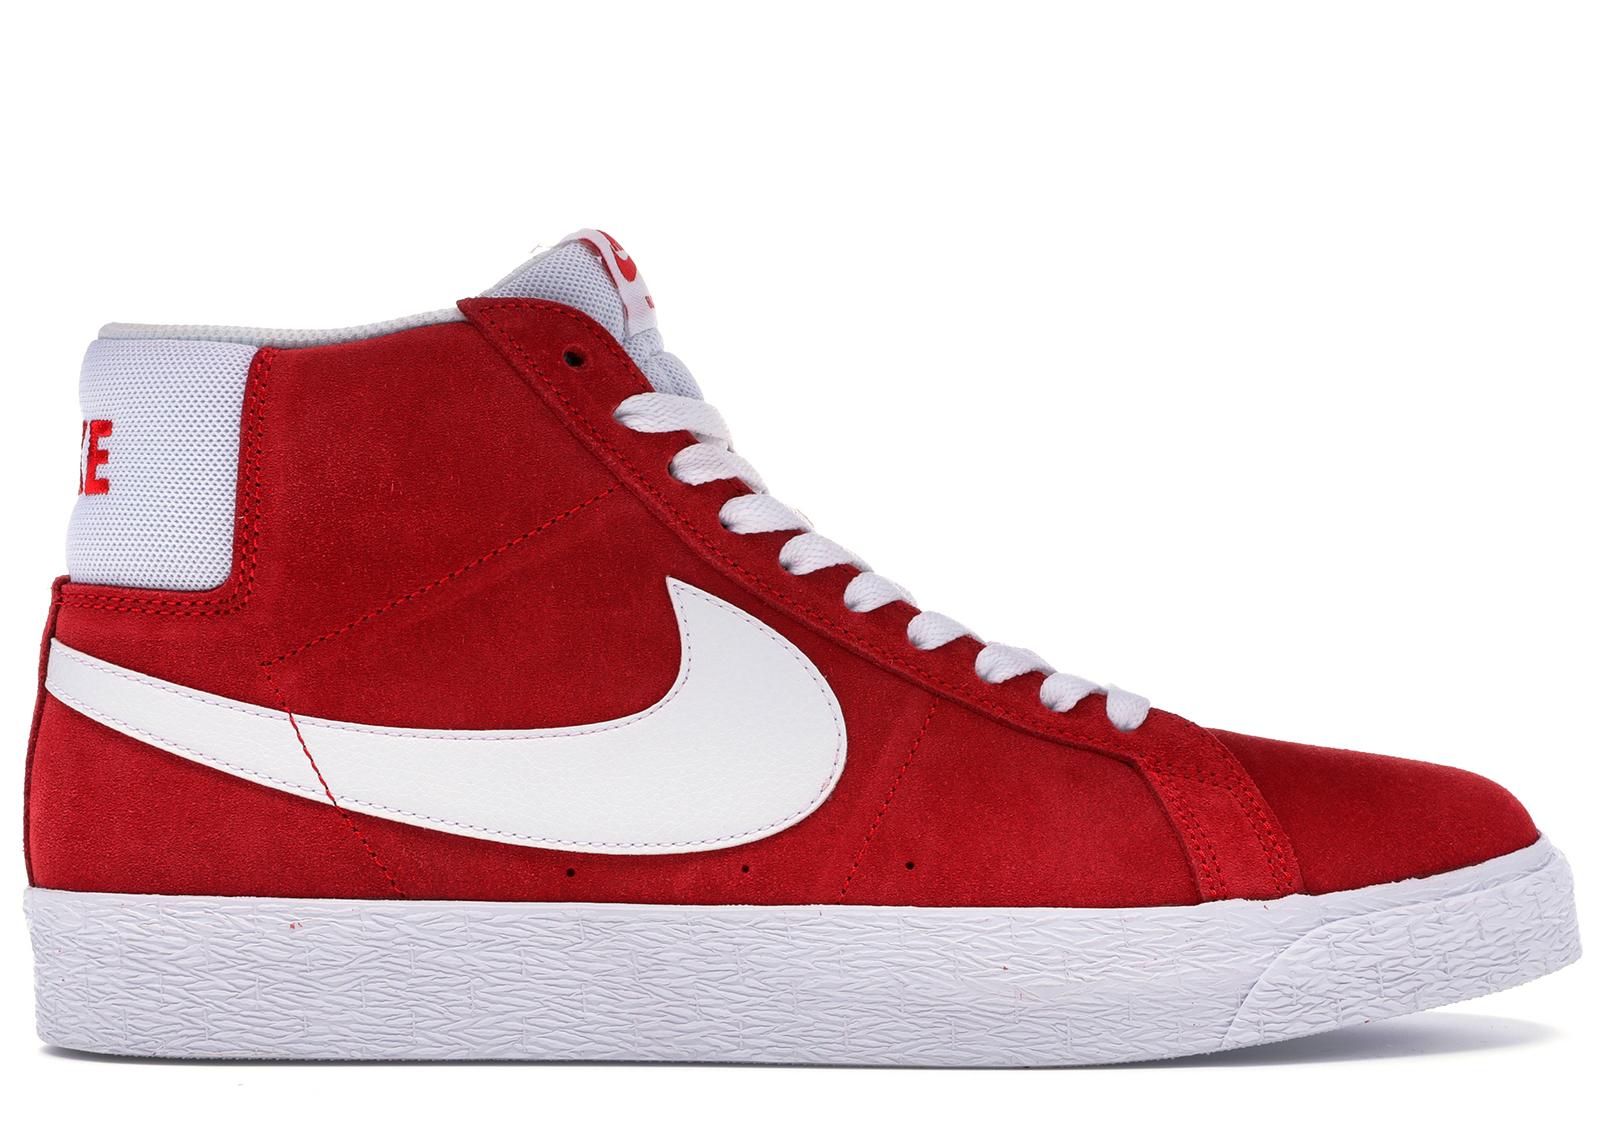 Nike SB Blazer Mid Red Suede (2017